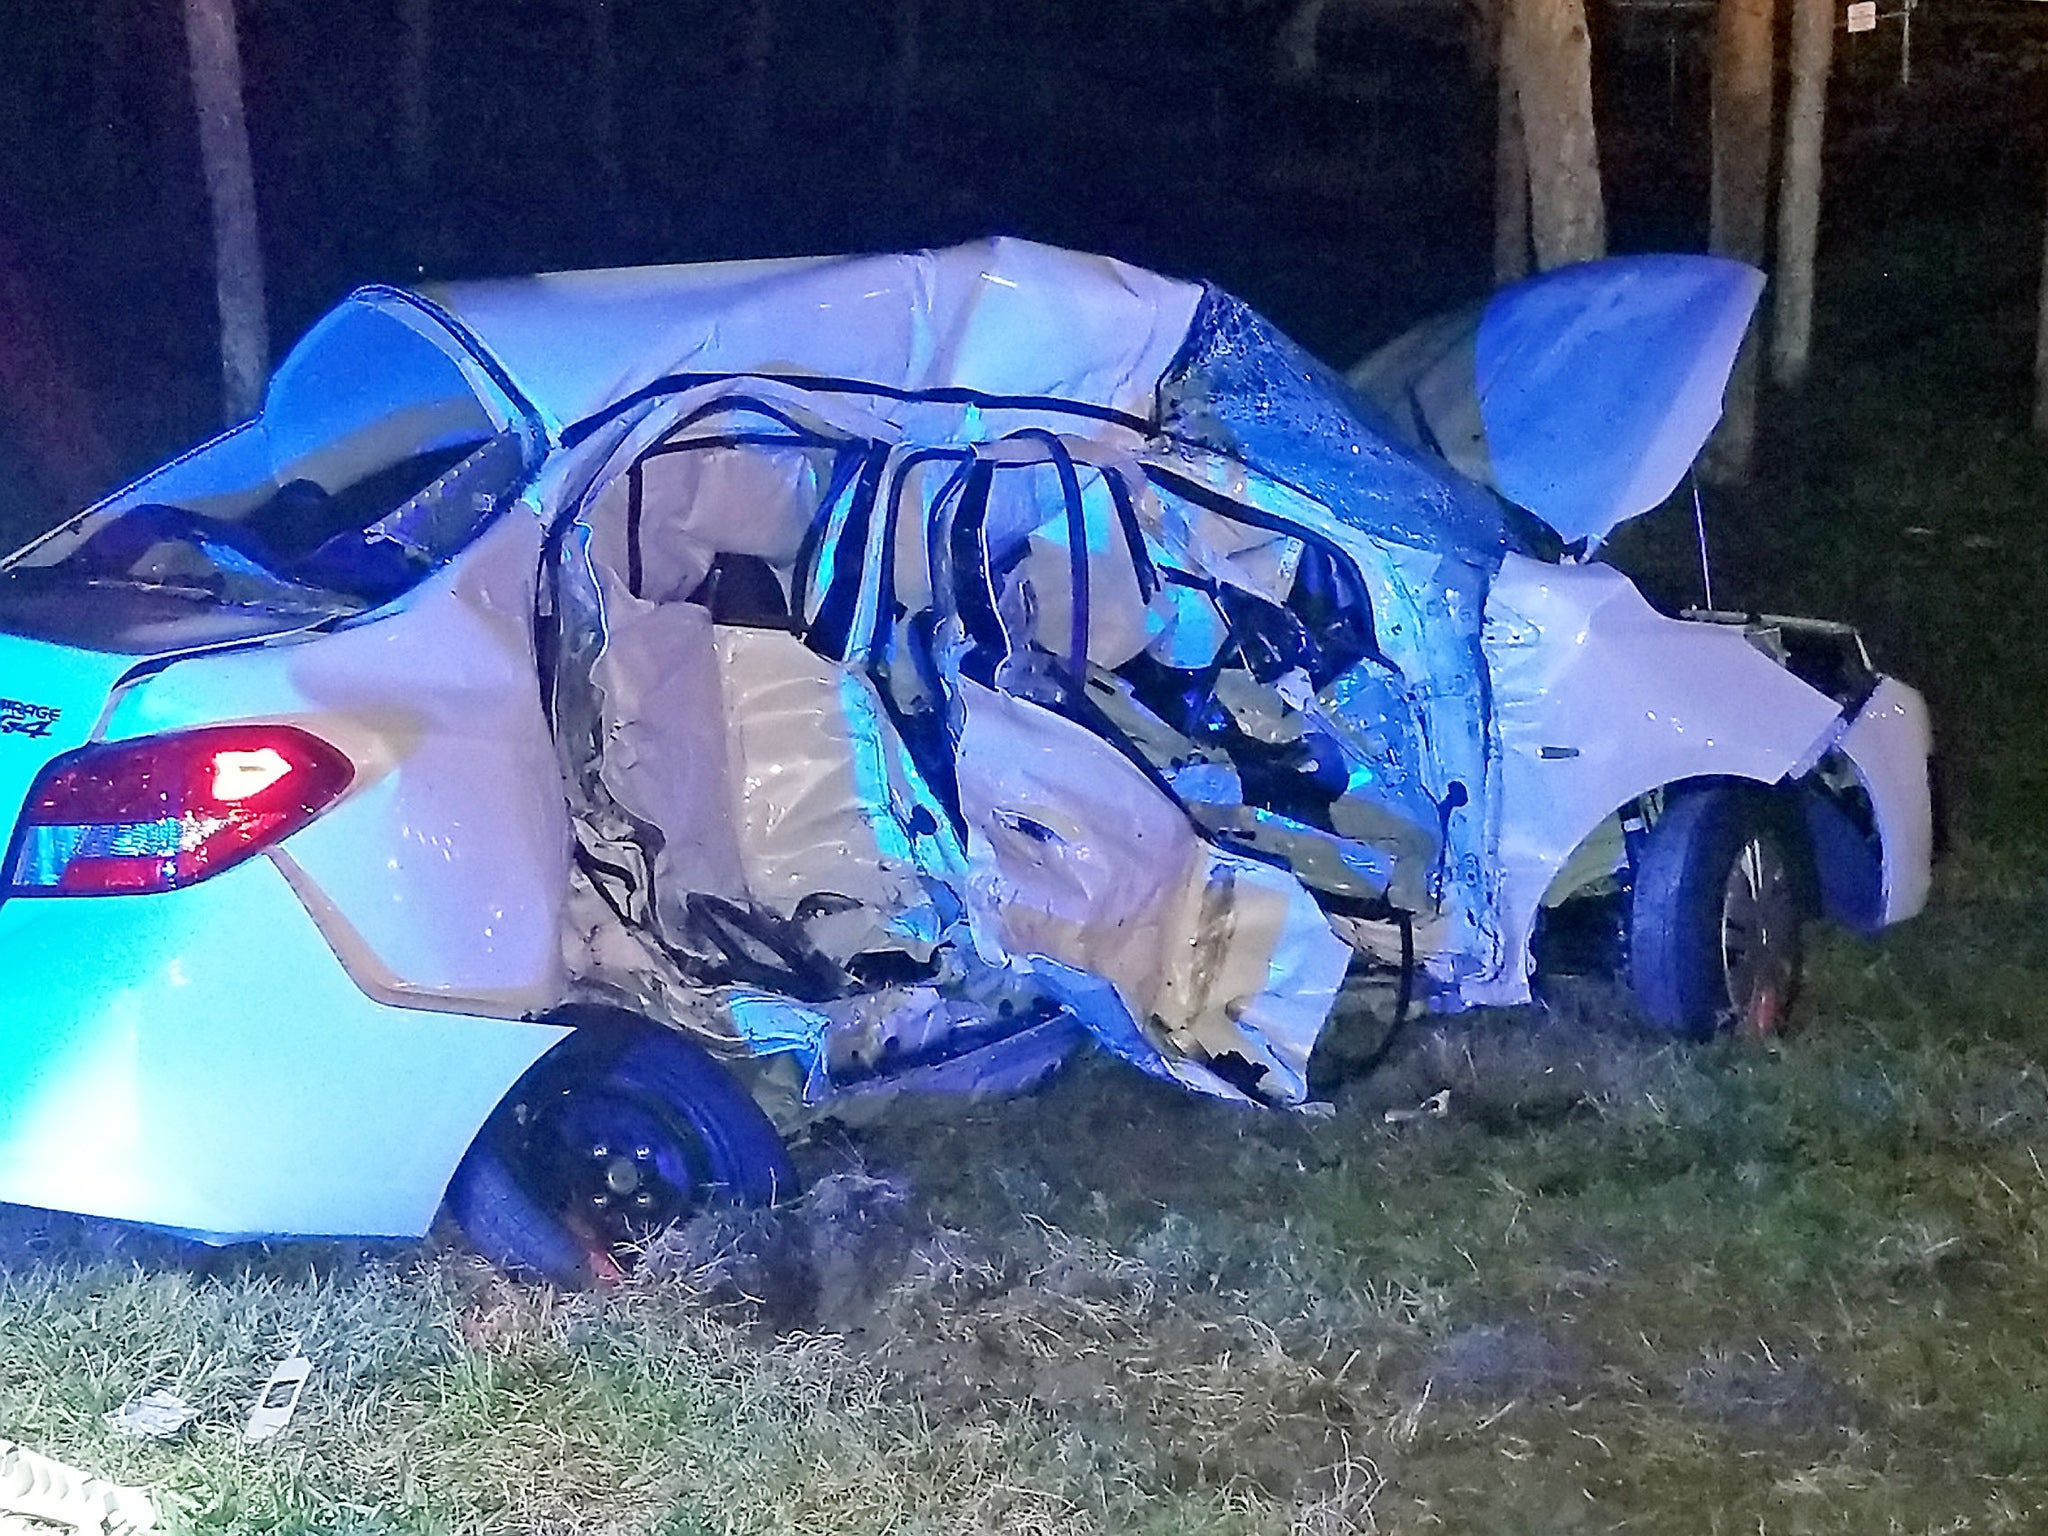 florida car crash kills four british family members the independent